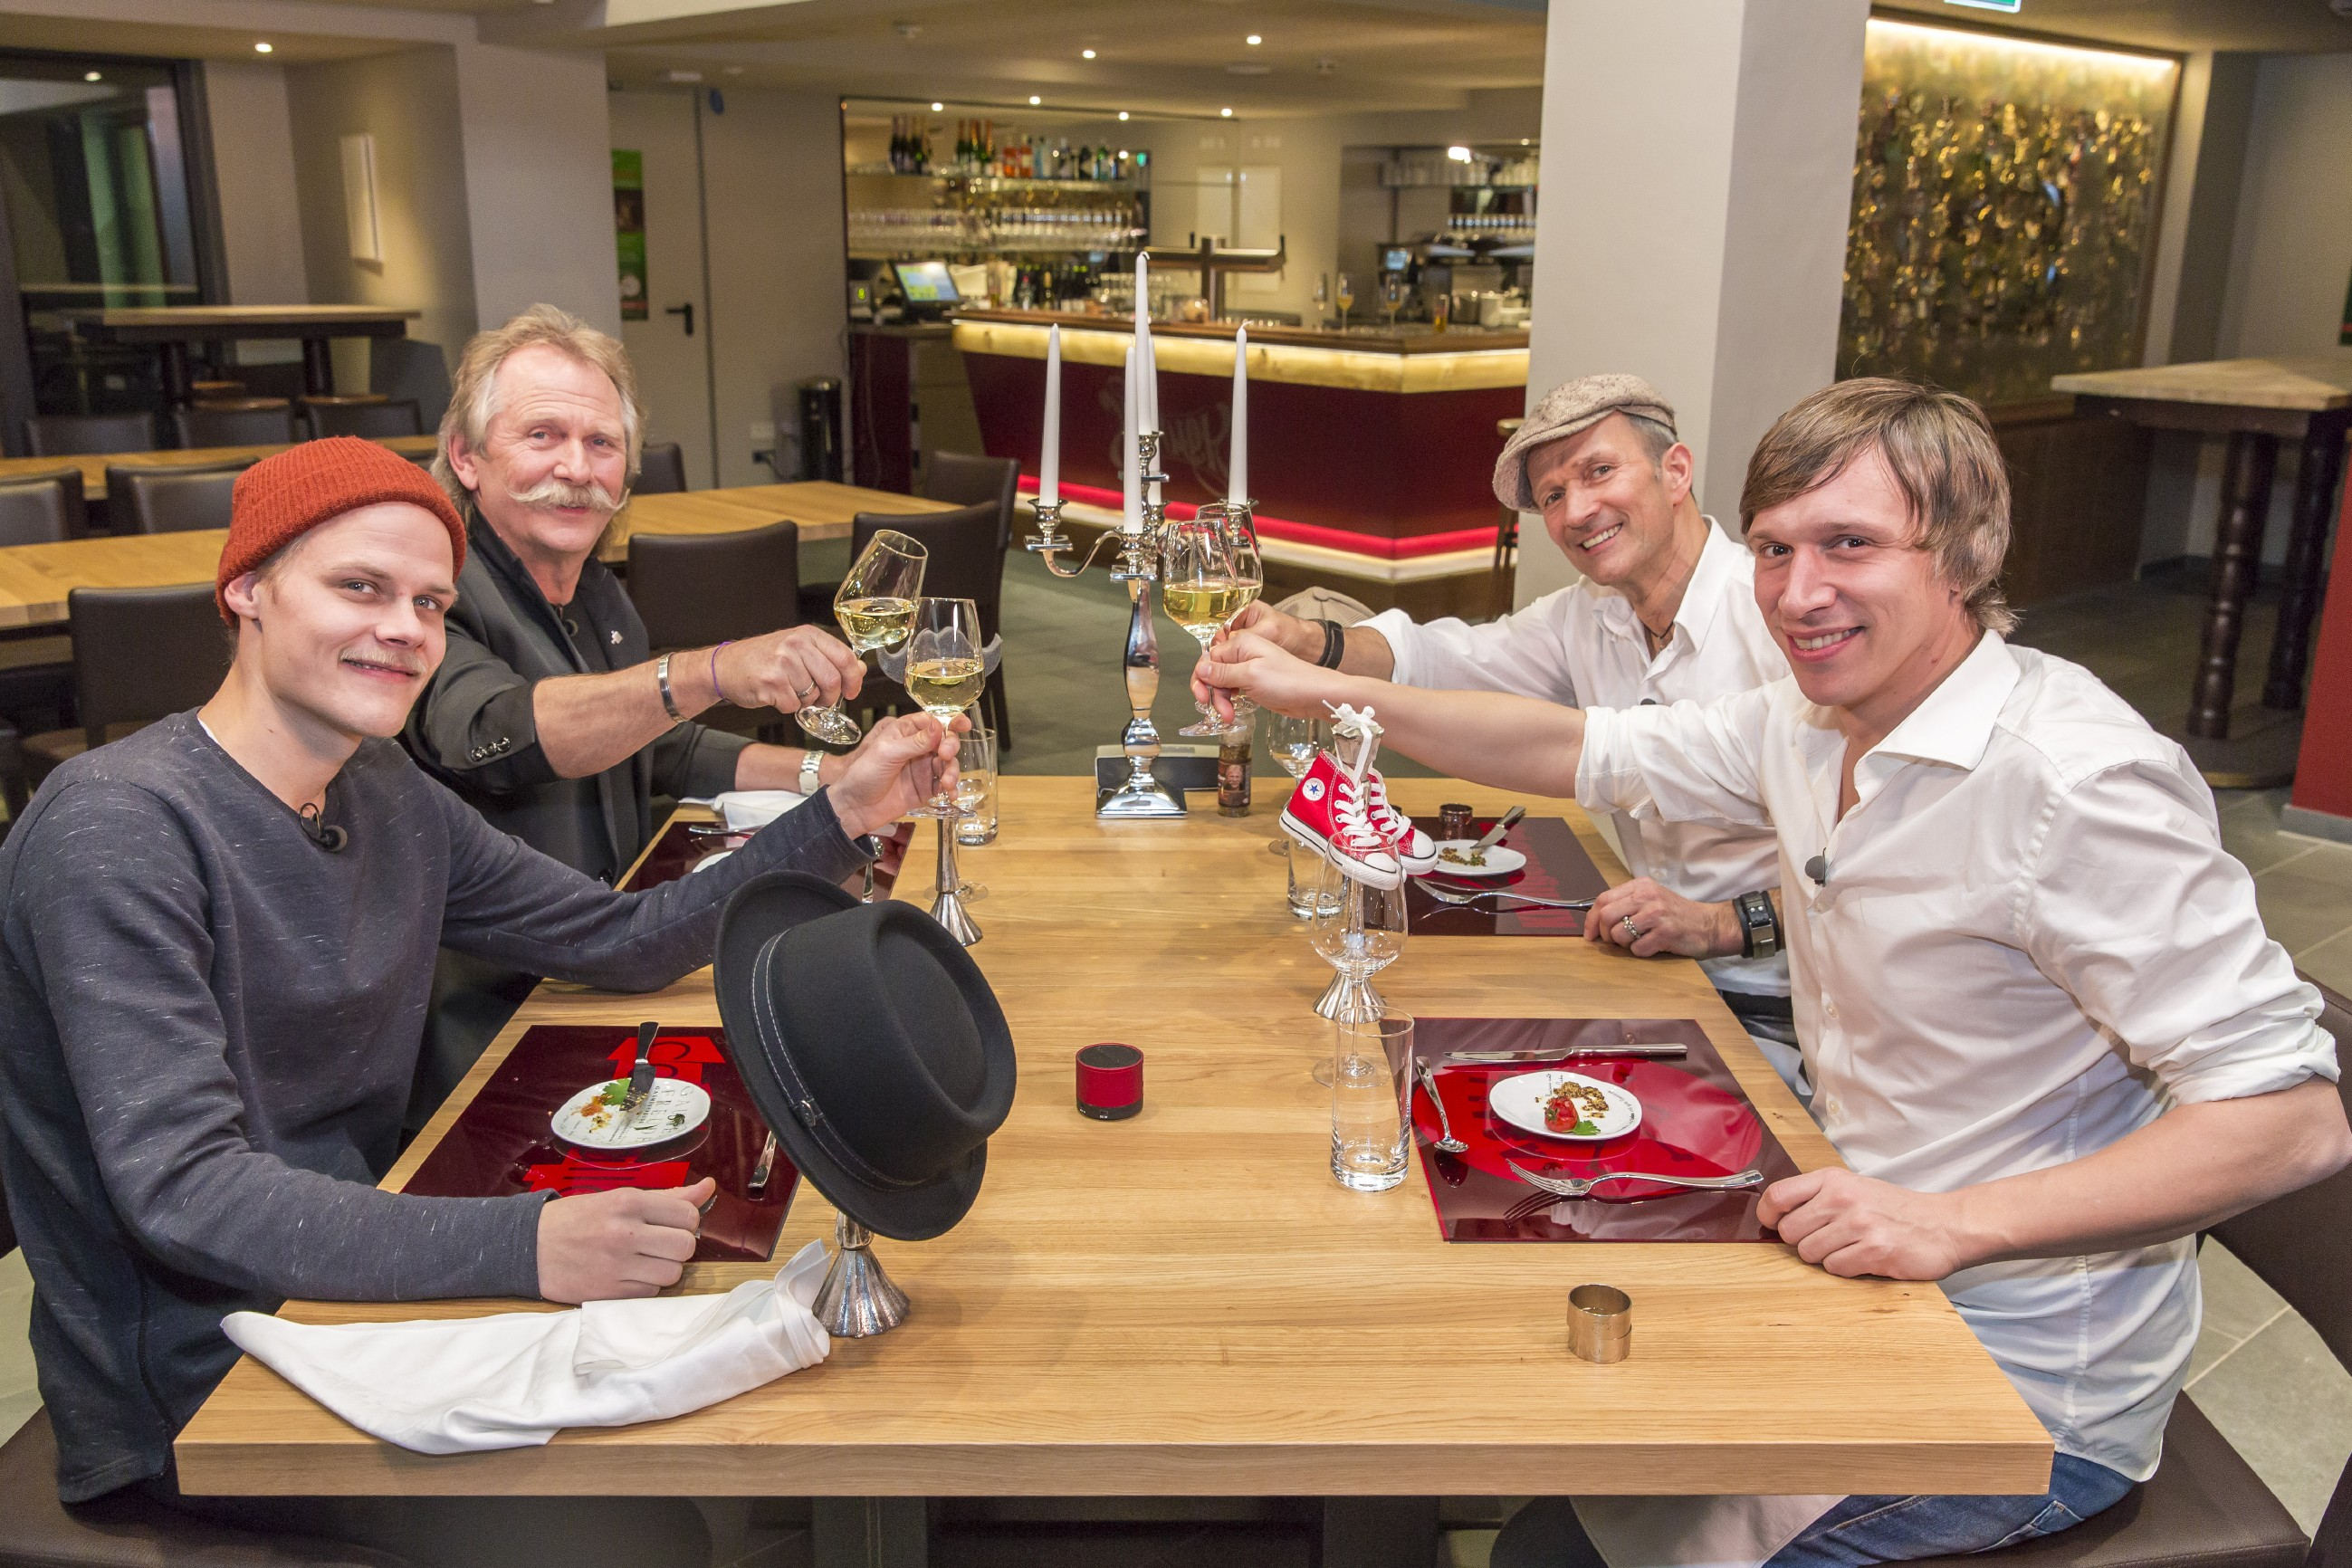 Promi Dinner - Oliver Niesen, Henning Krautmacher, Frank Reudenbach und Bastian Campmann